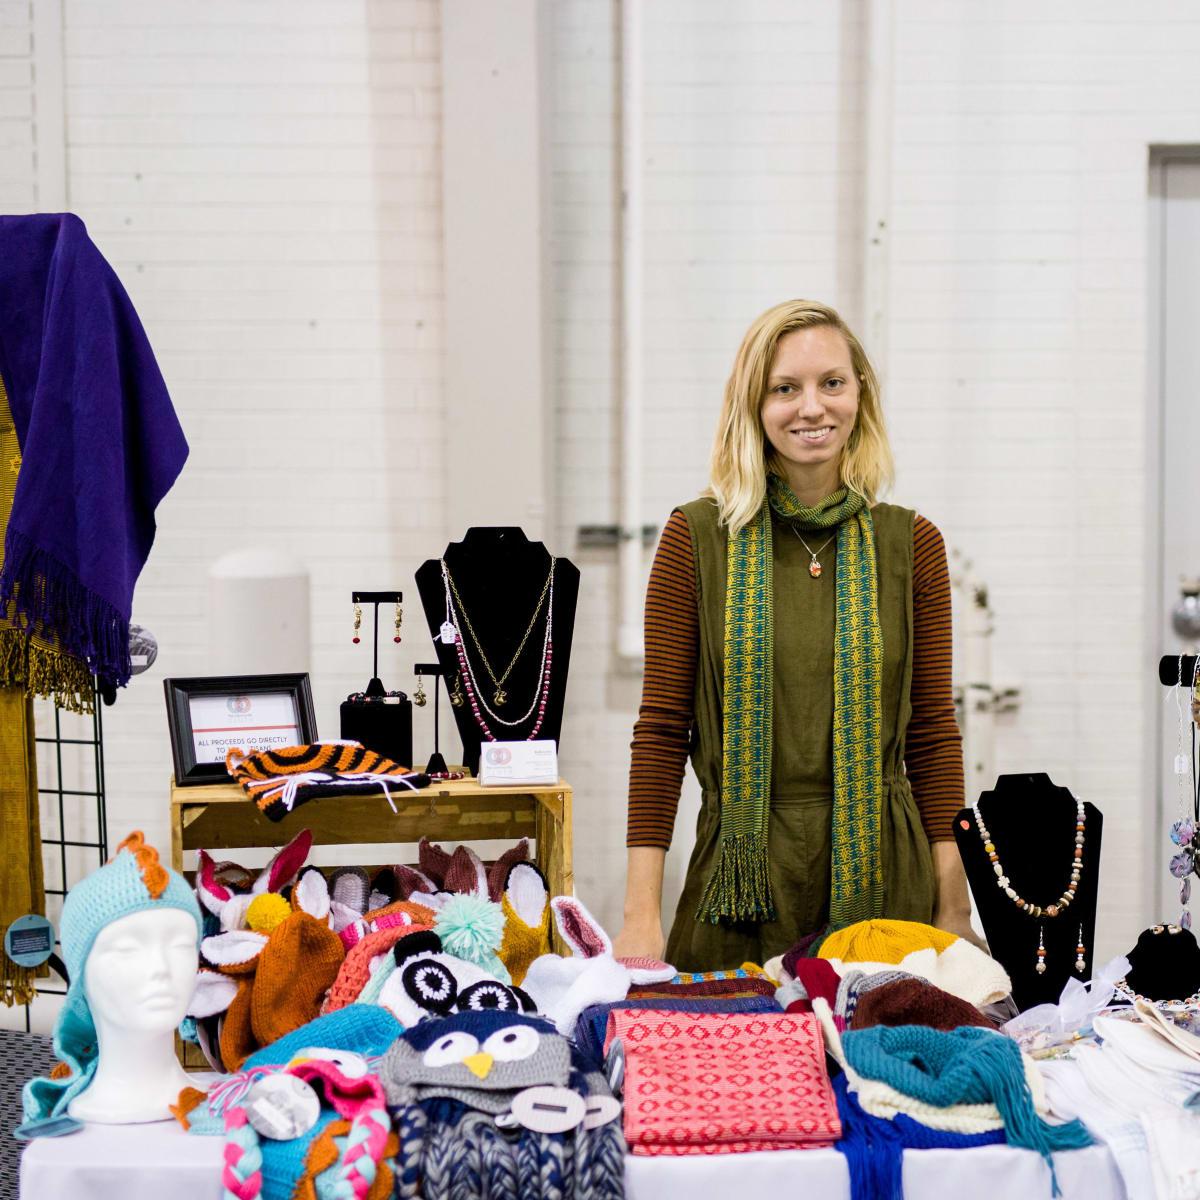 Houston, CultureMap Holiday Pop-Up Shop, November 2017, The Community Cloth, Kaila Lewis